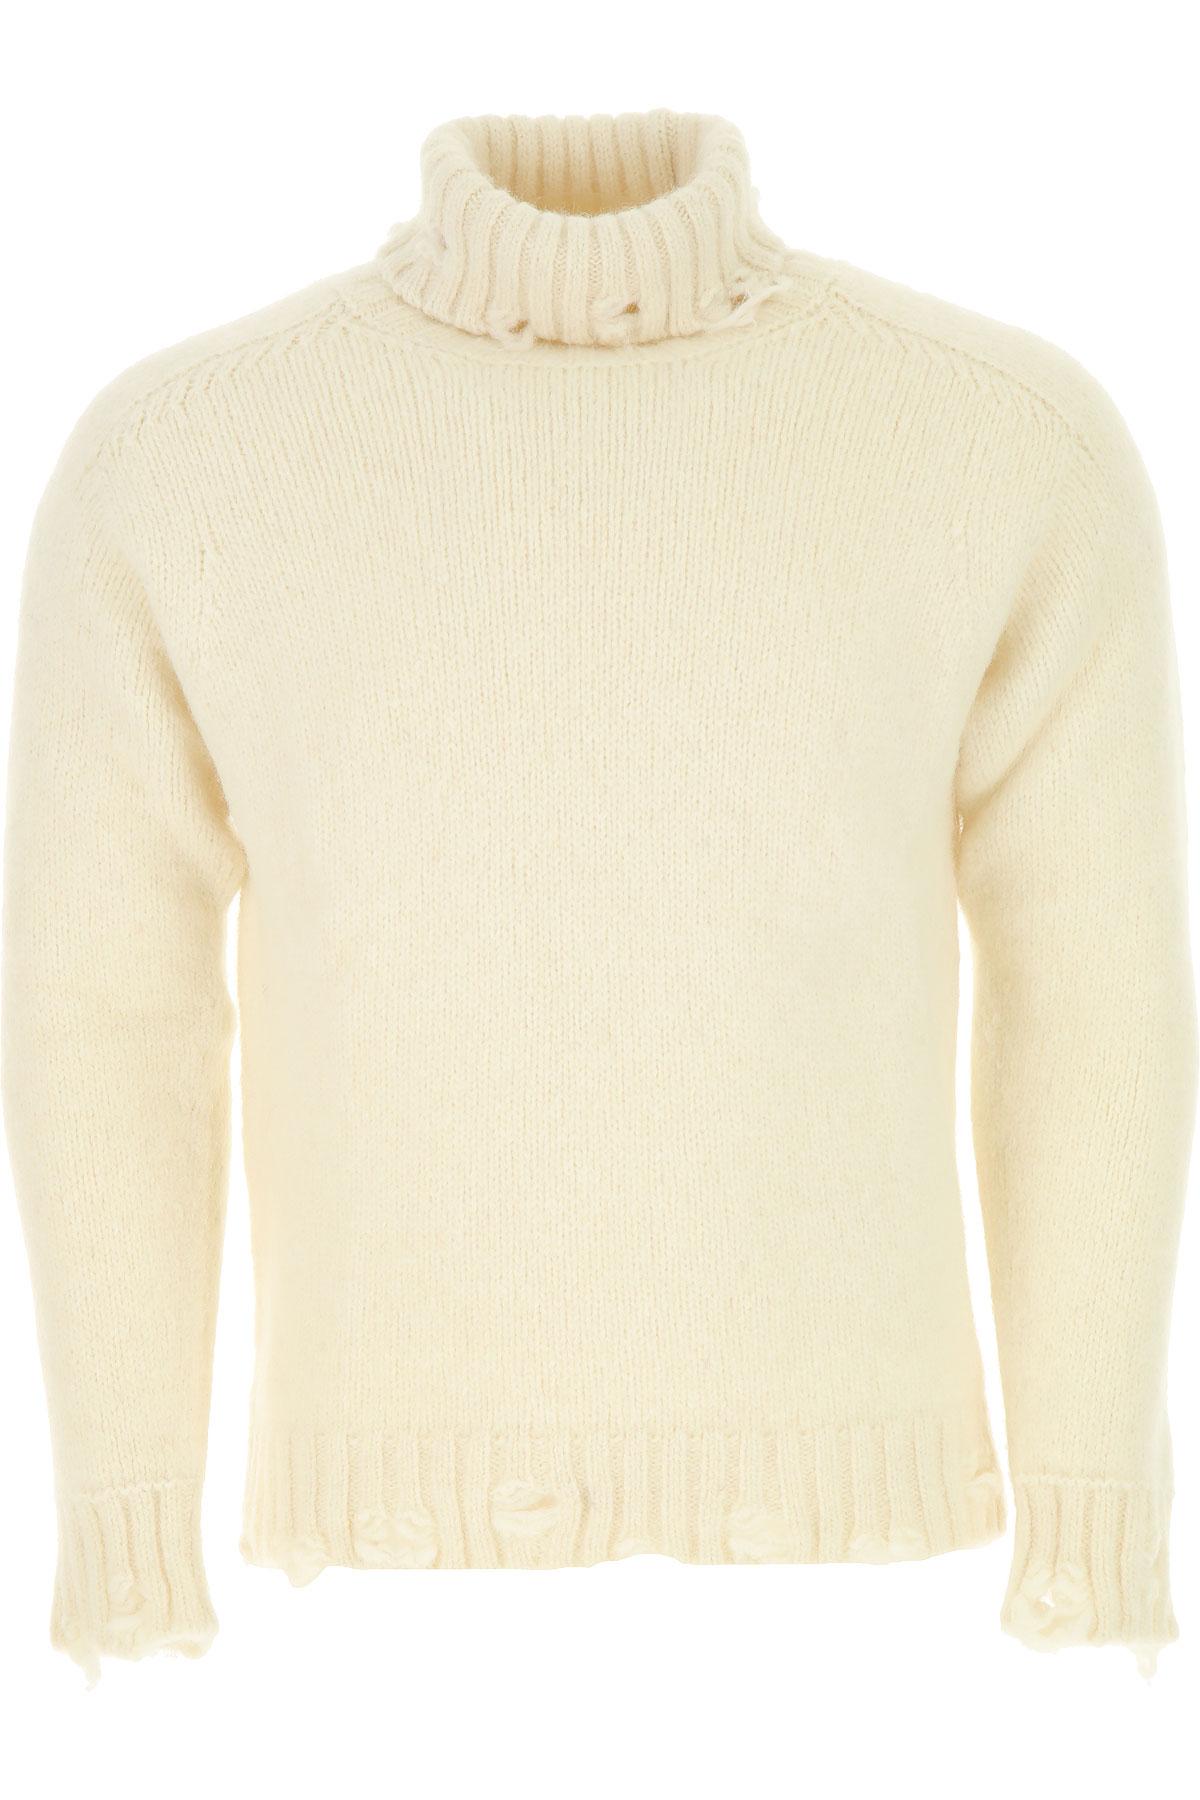 Image of Maison Flaneur Sweater for Men Jumper, White, alcapa, 2017, L M XL